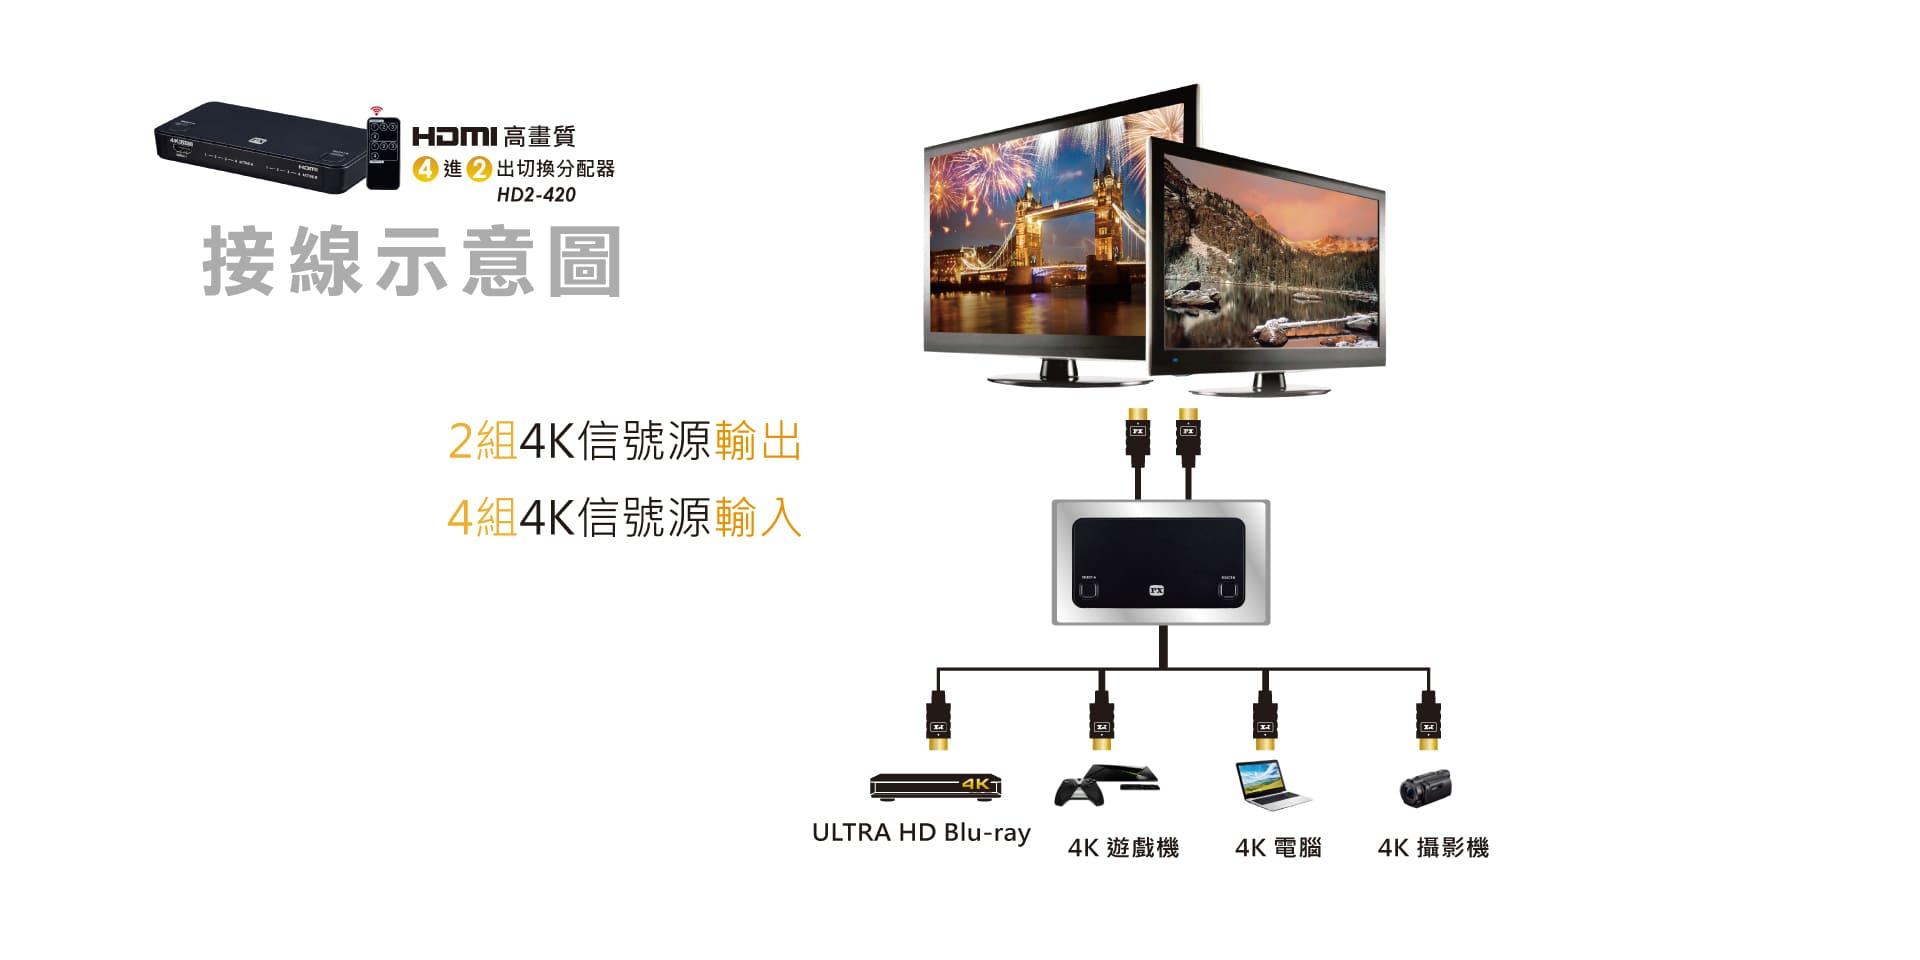 proimages/product/HDMI/HD2-420/HD2-420_05.jpg